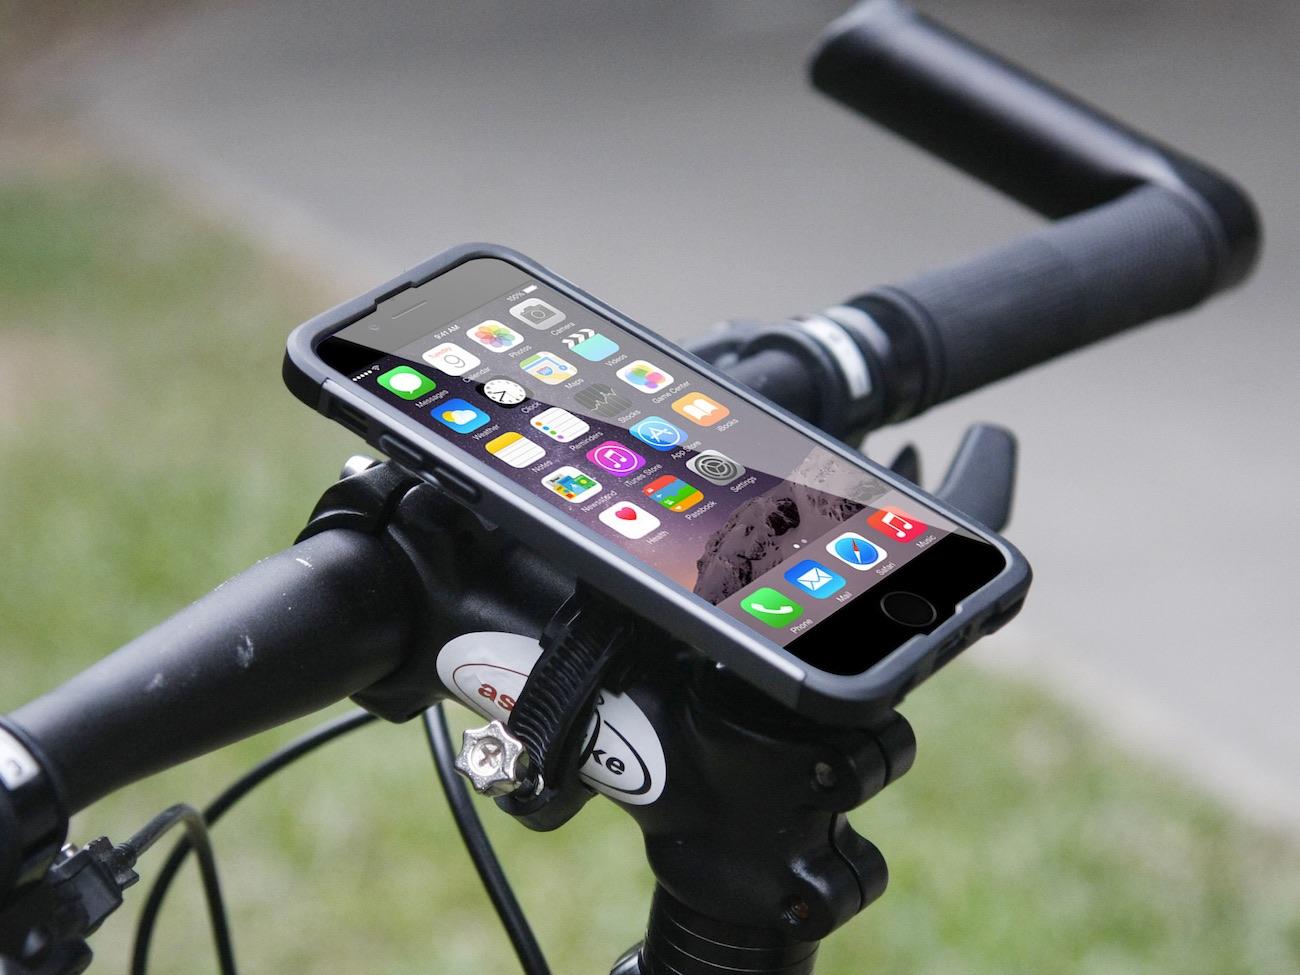 Armor X Iphone 6 Mount Case For Jogging Car Bike